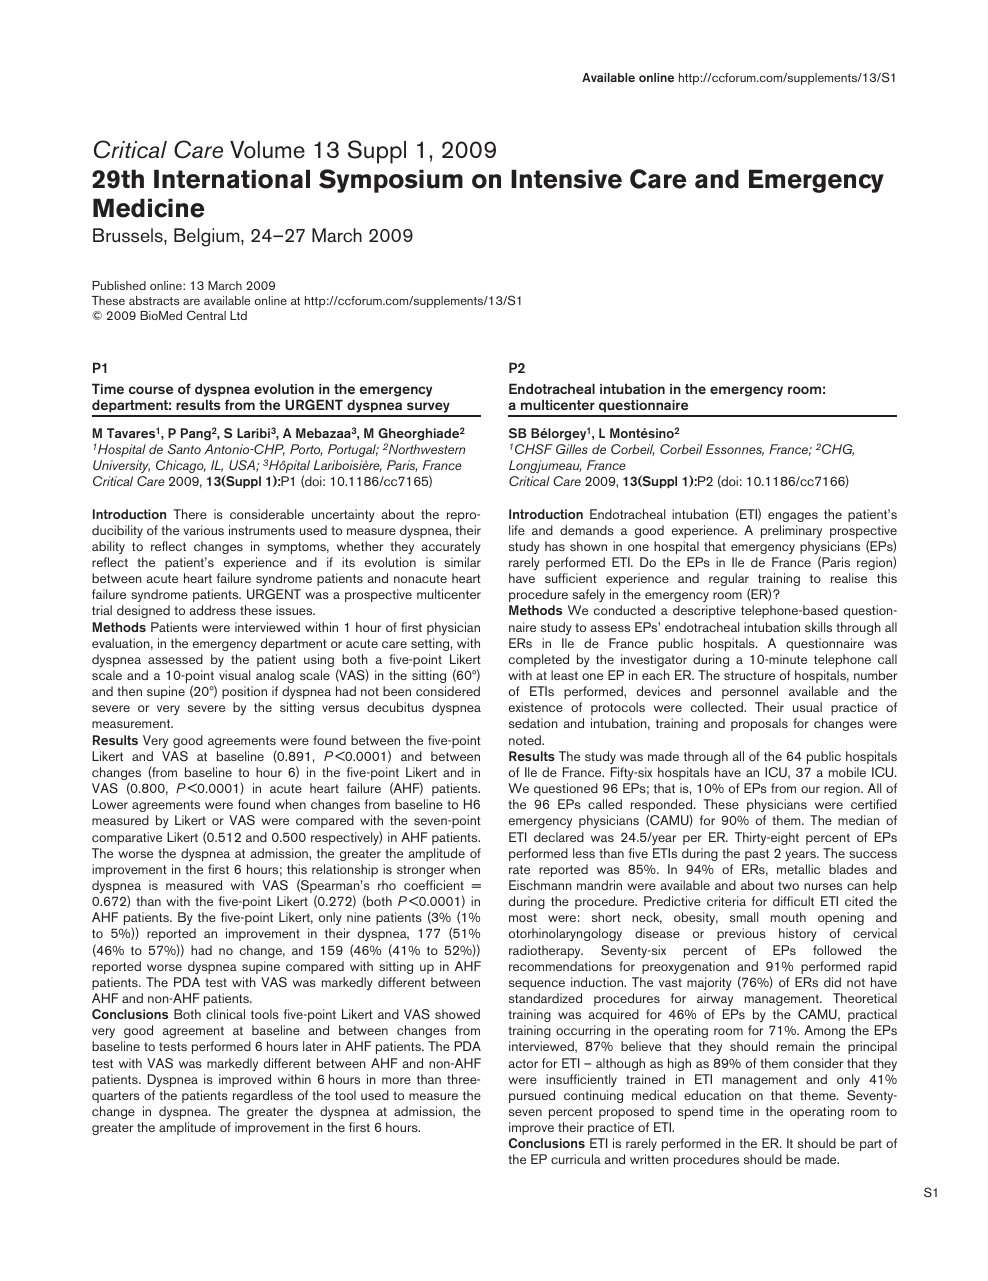 Comparison of three noninvasive cardiac output monitors in patients